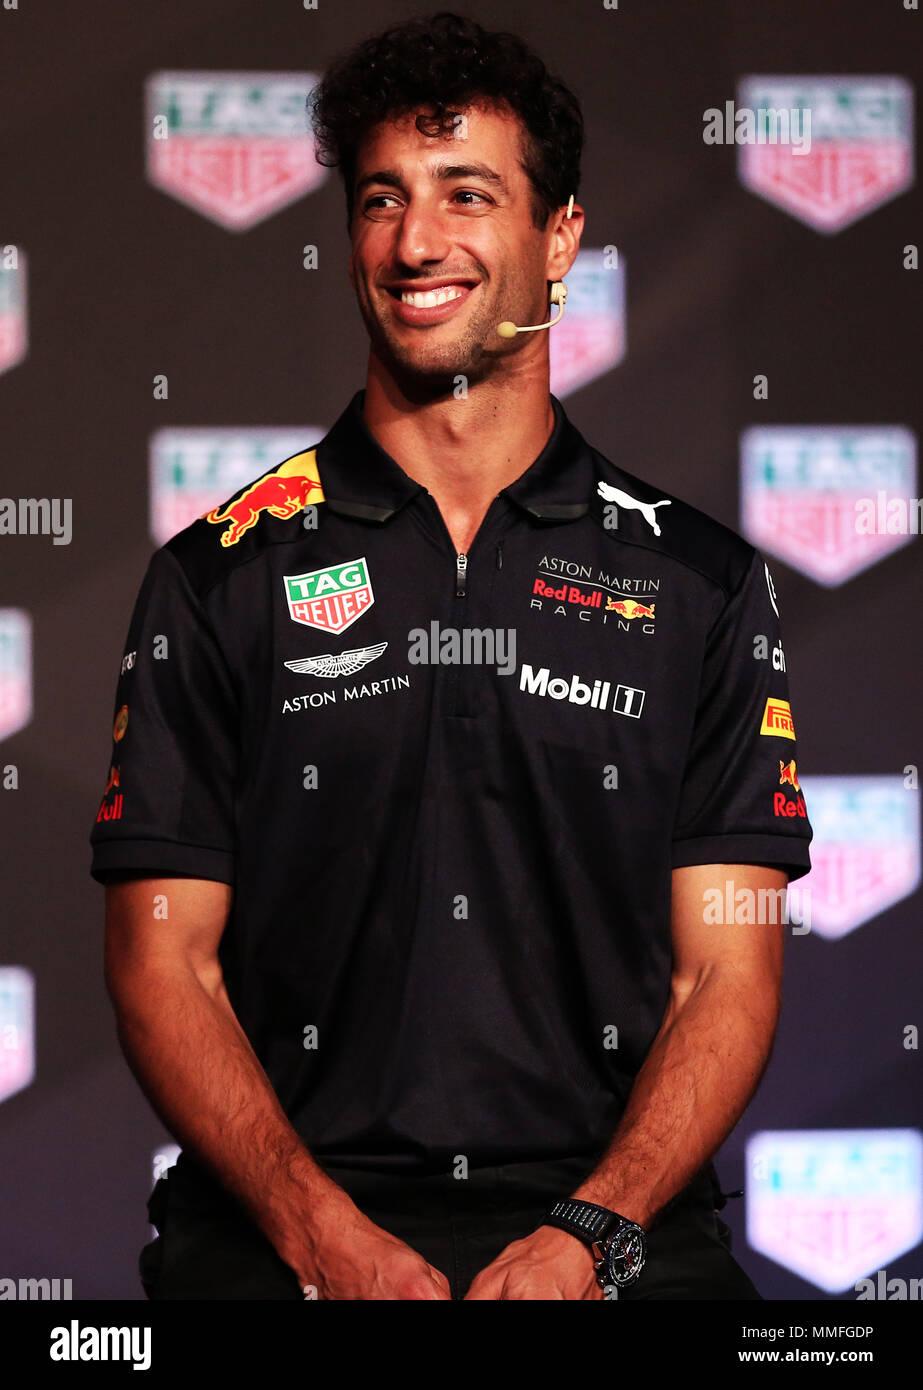 Barcelona -10th May 2018- SPAIN: Daniel Ricciardo during the Aston Martin Red Bull Racing TAG Heuer, in Barcelona, on 5th May 2018. Photo: Joan Valls/Urbanandsport/Cordon Press - Stock Image